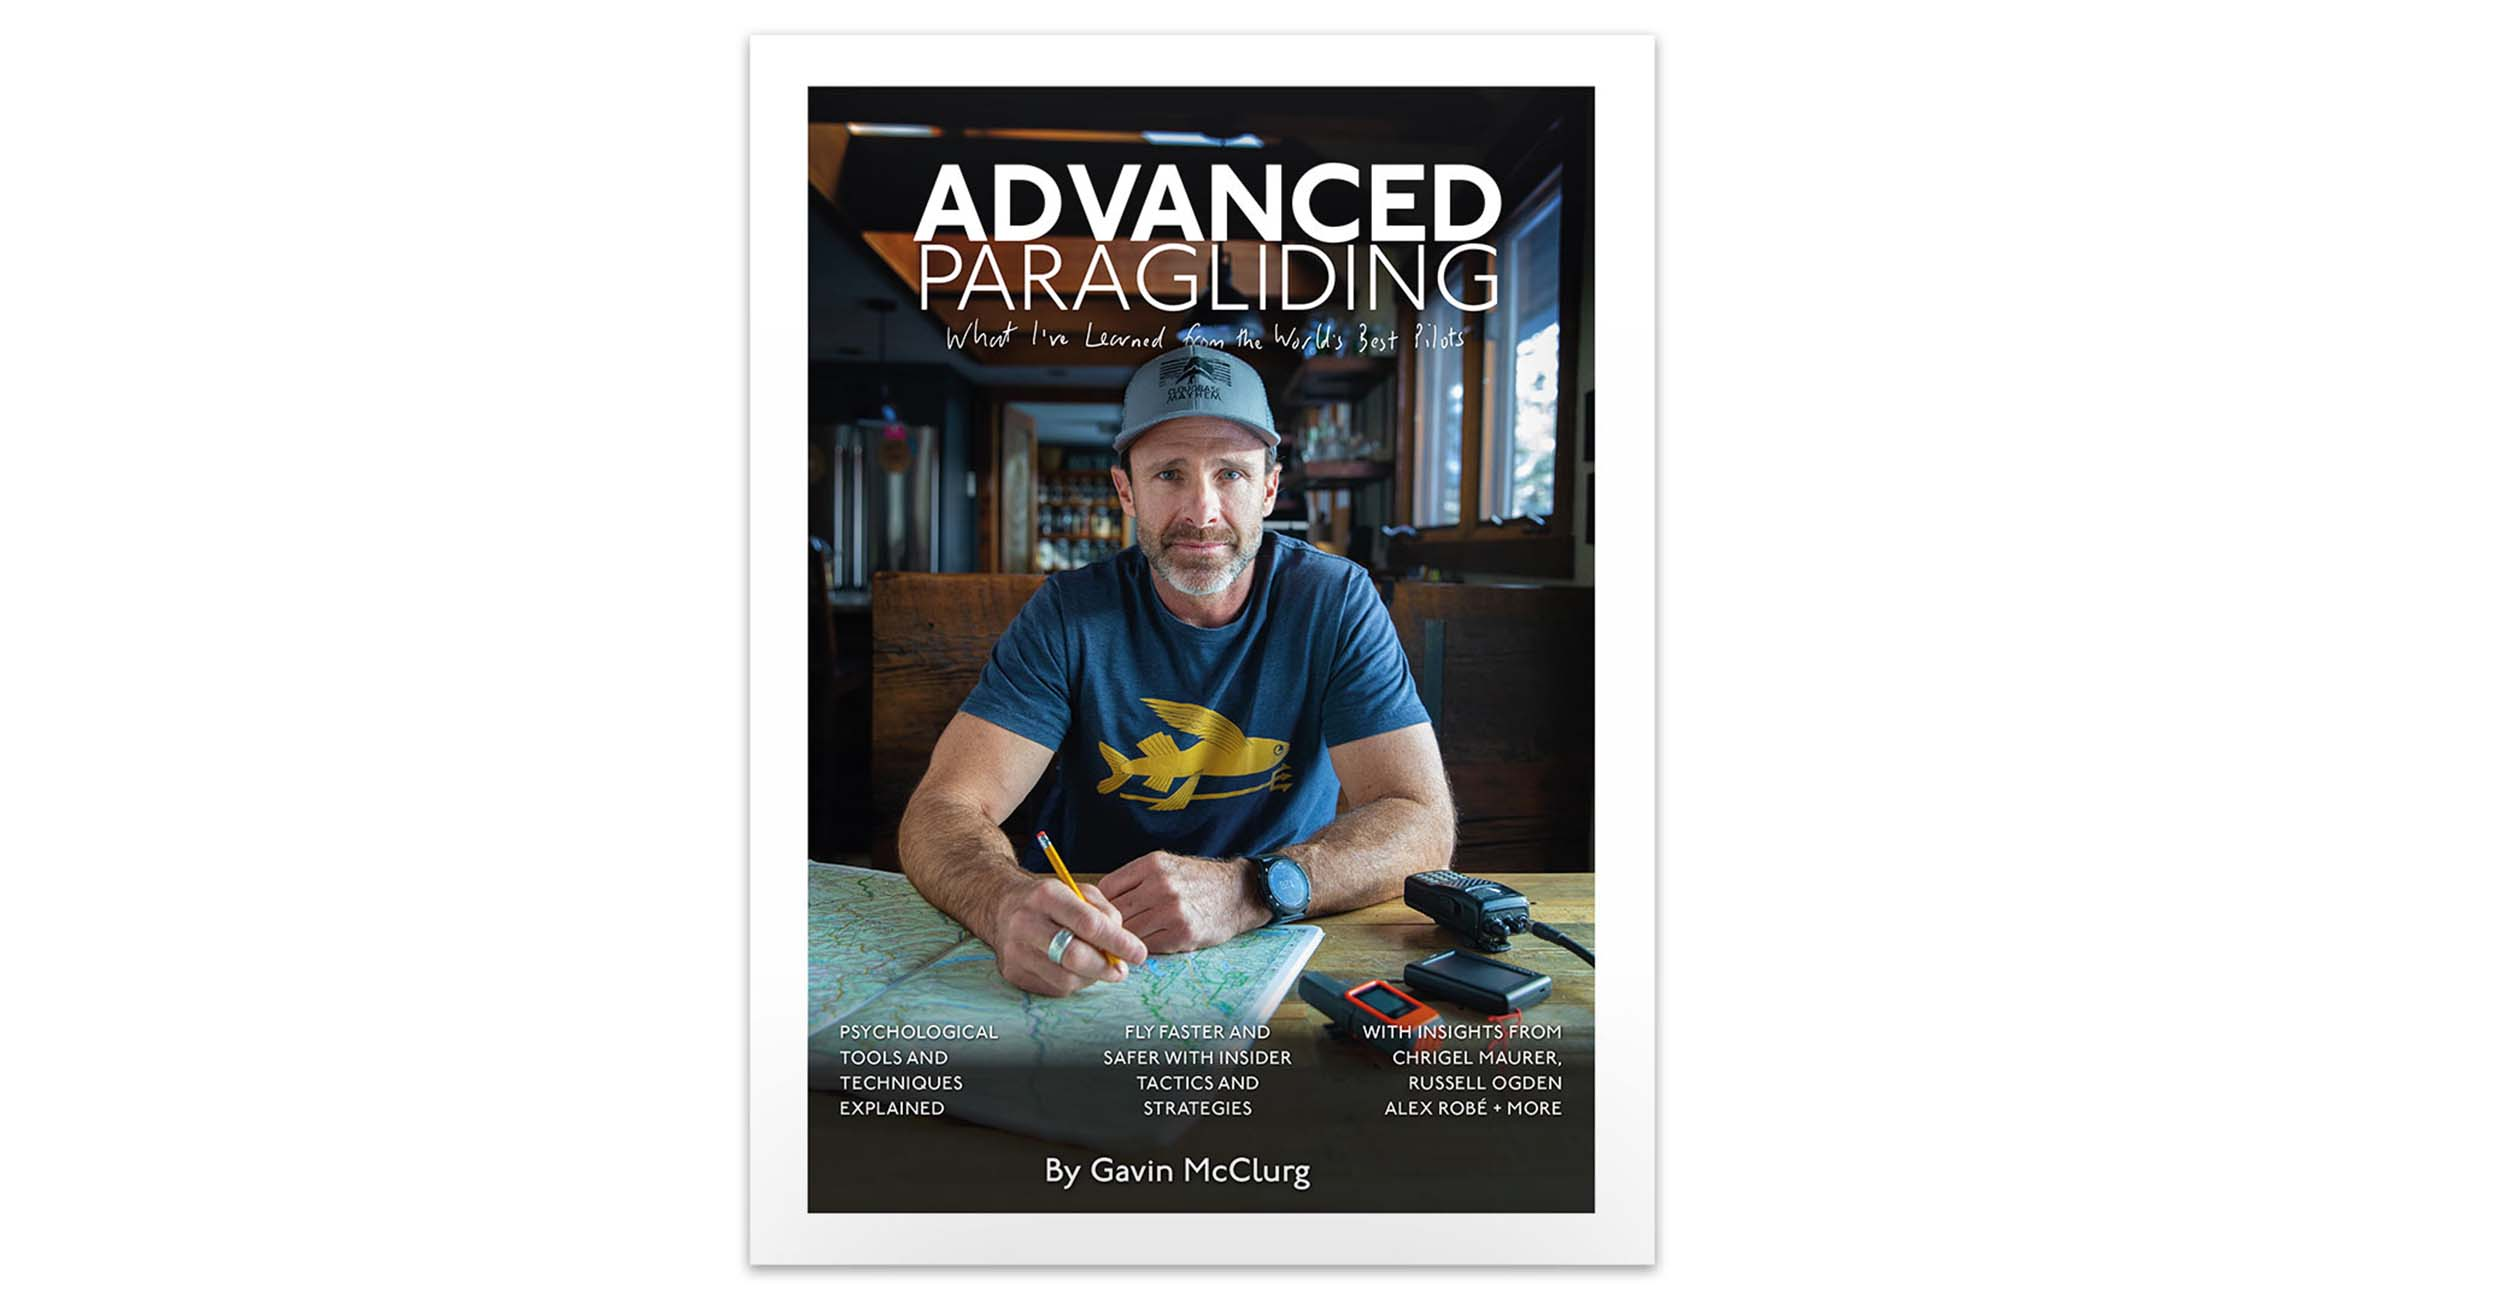 Advanced-Paragliding-Gavin-McClurg-2500